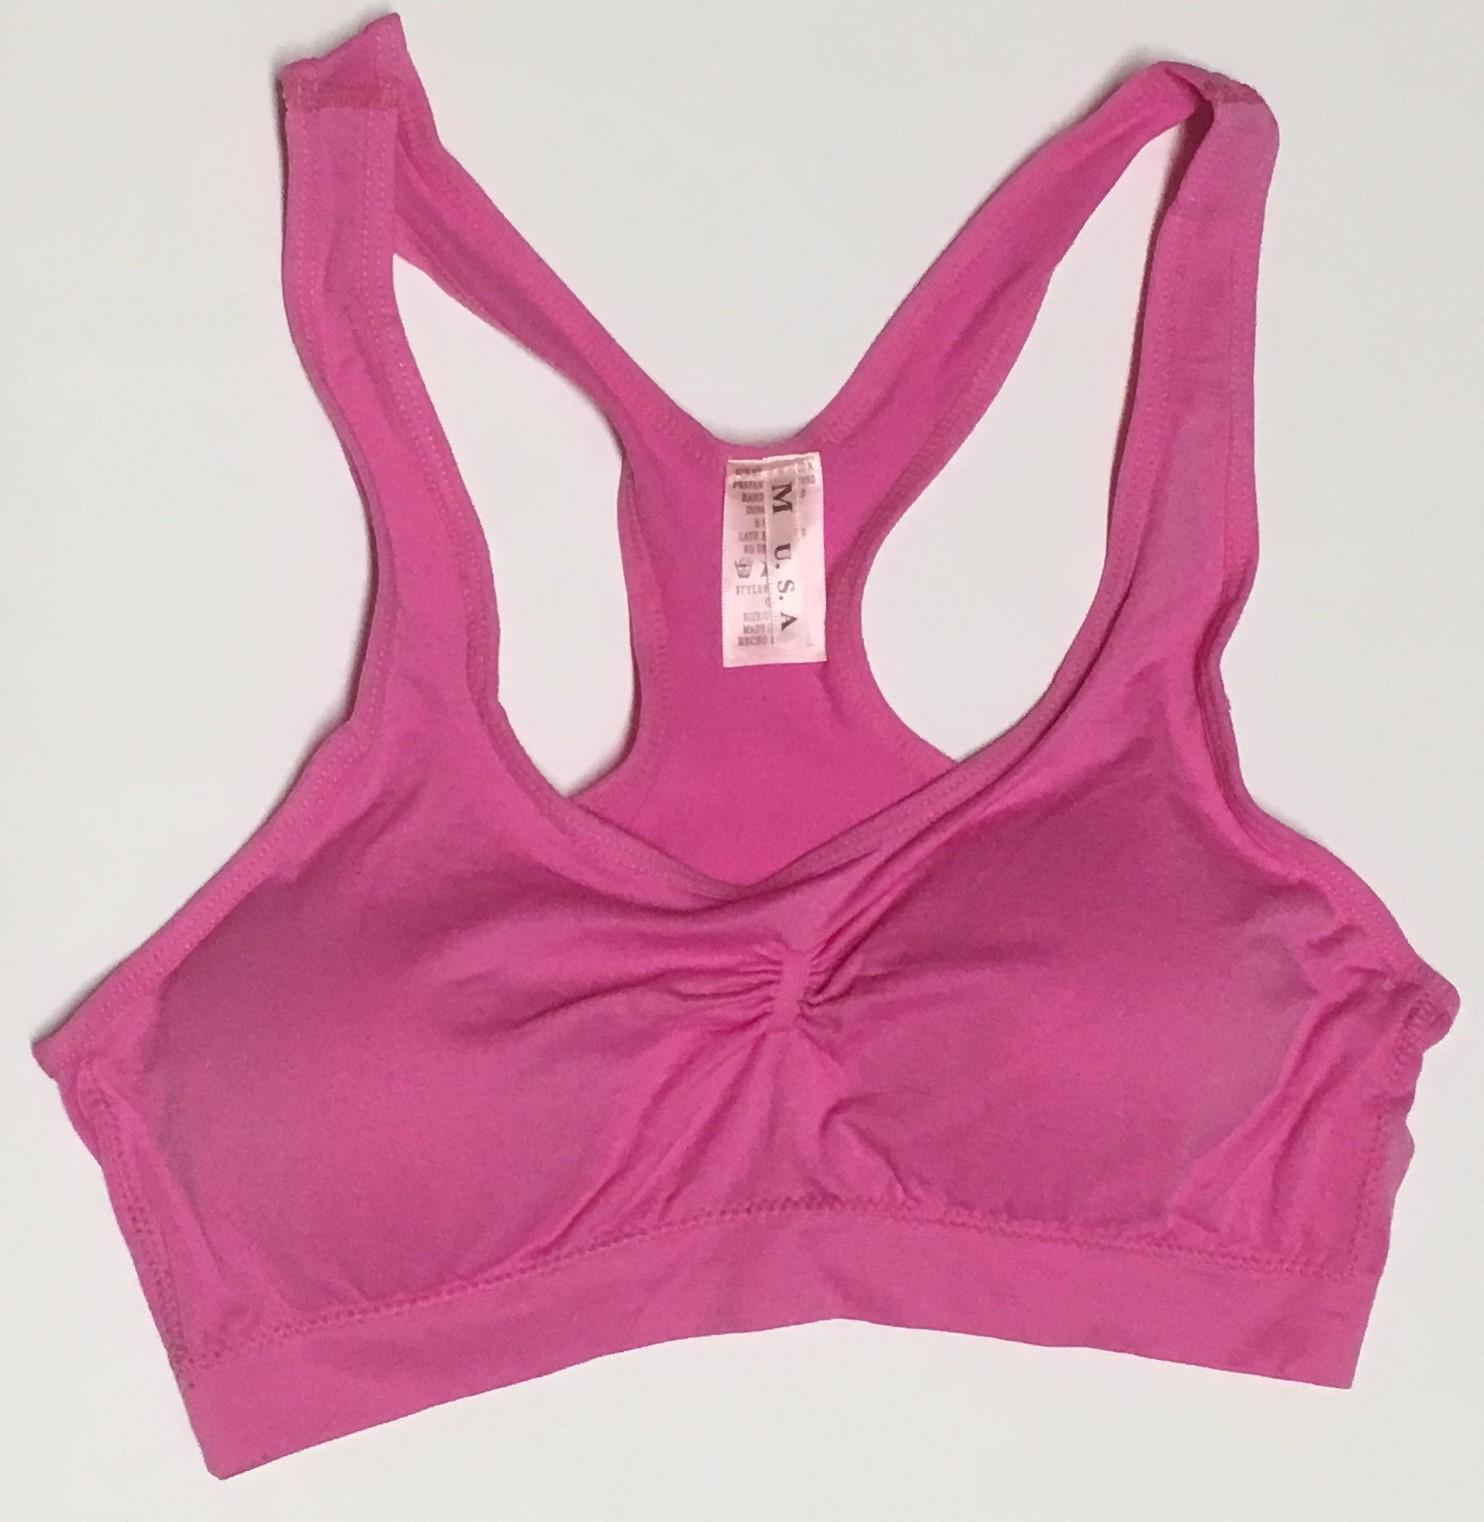 Women's Sport Support Bra Light Pink SZ Medium Light Padding image 2